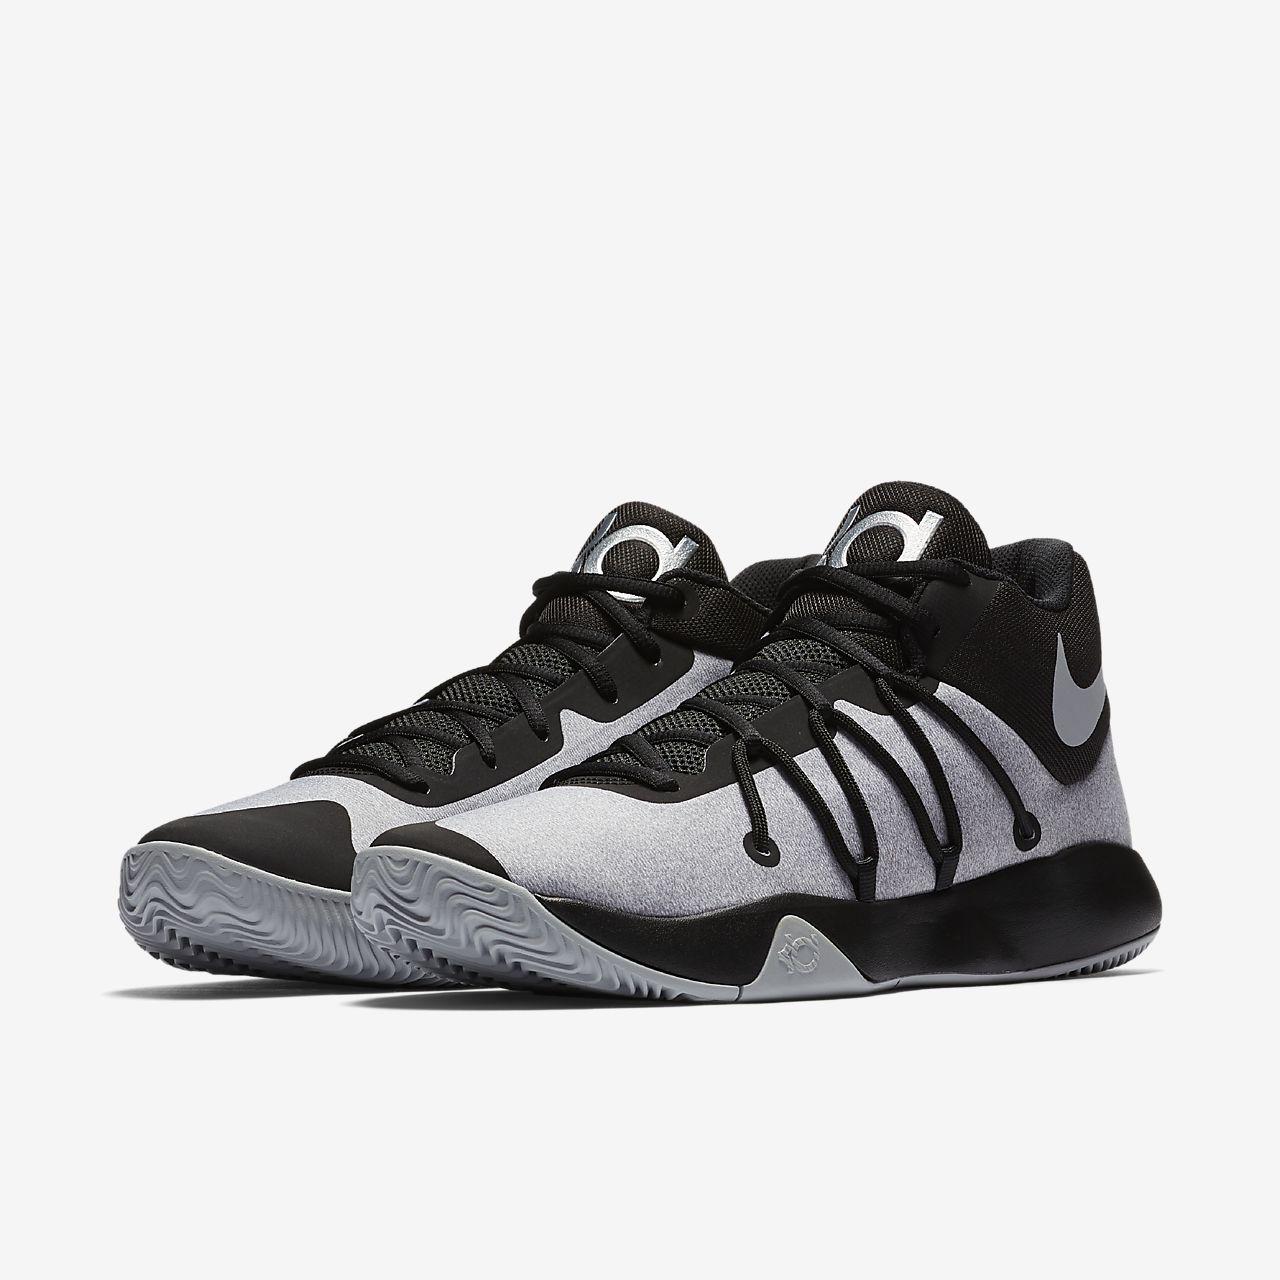 KD Trey 5 V Men's Basketball Shoe | Nike kd shoes, Running